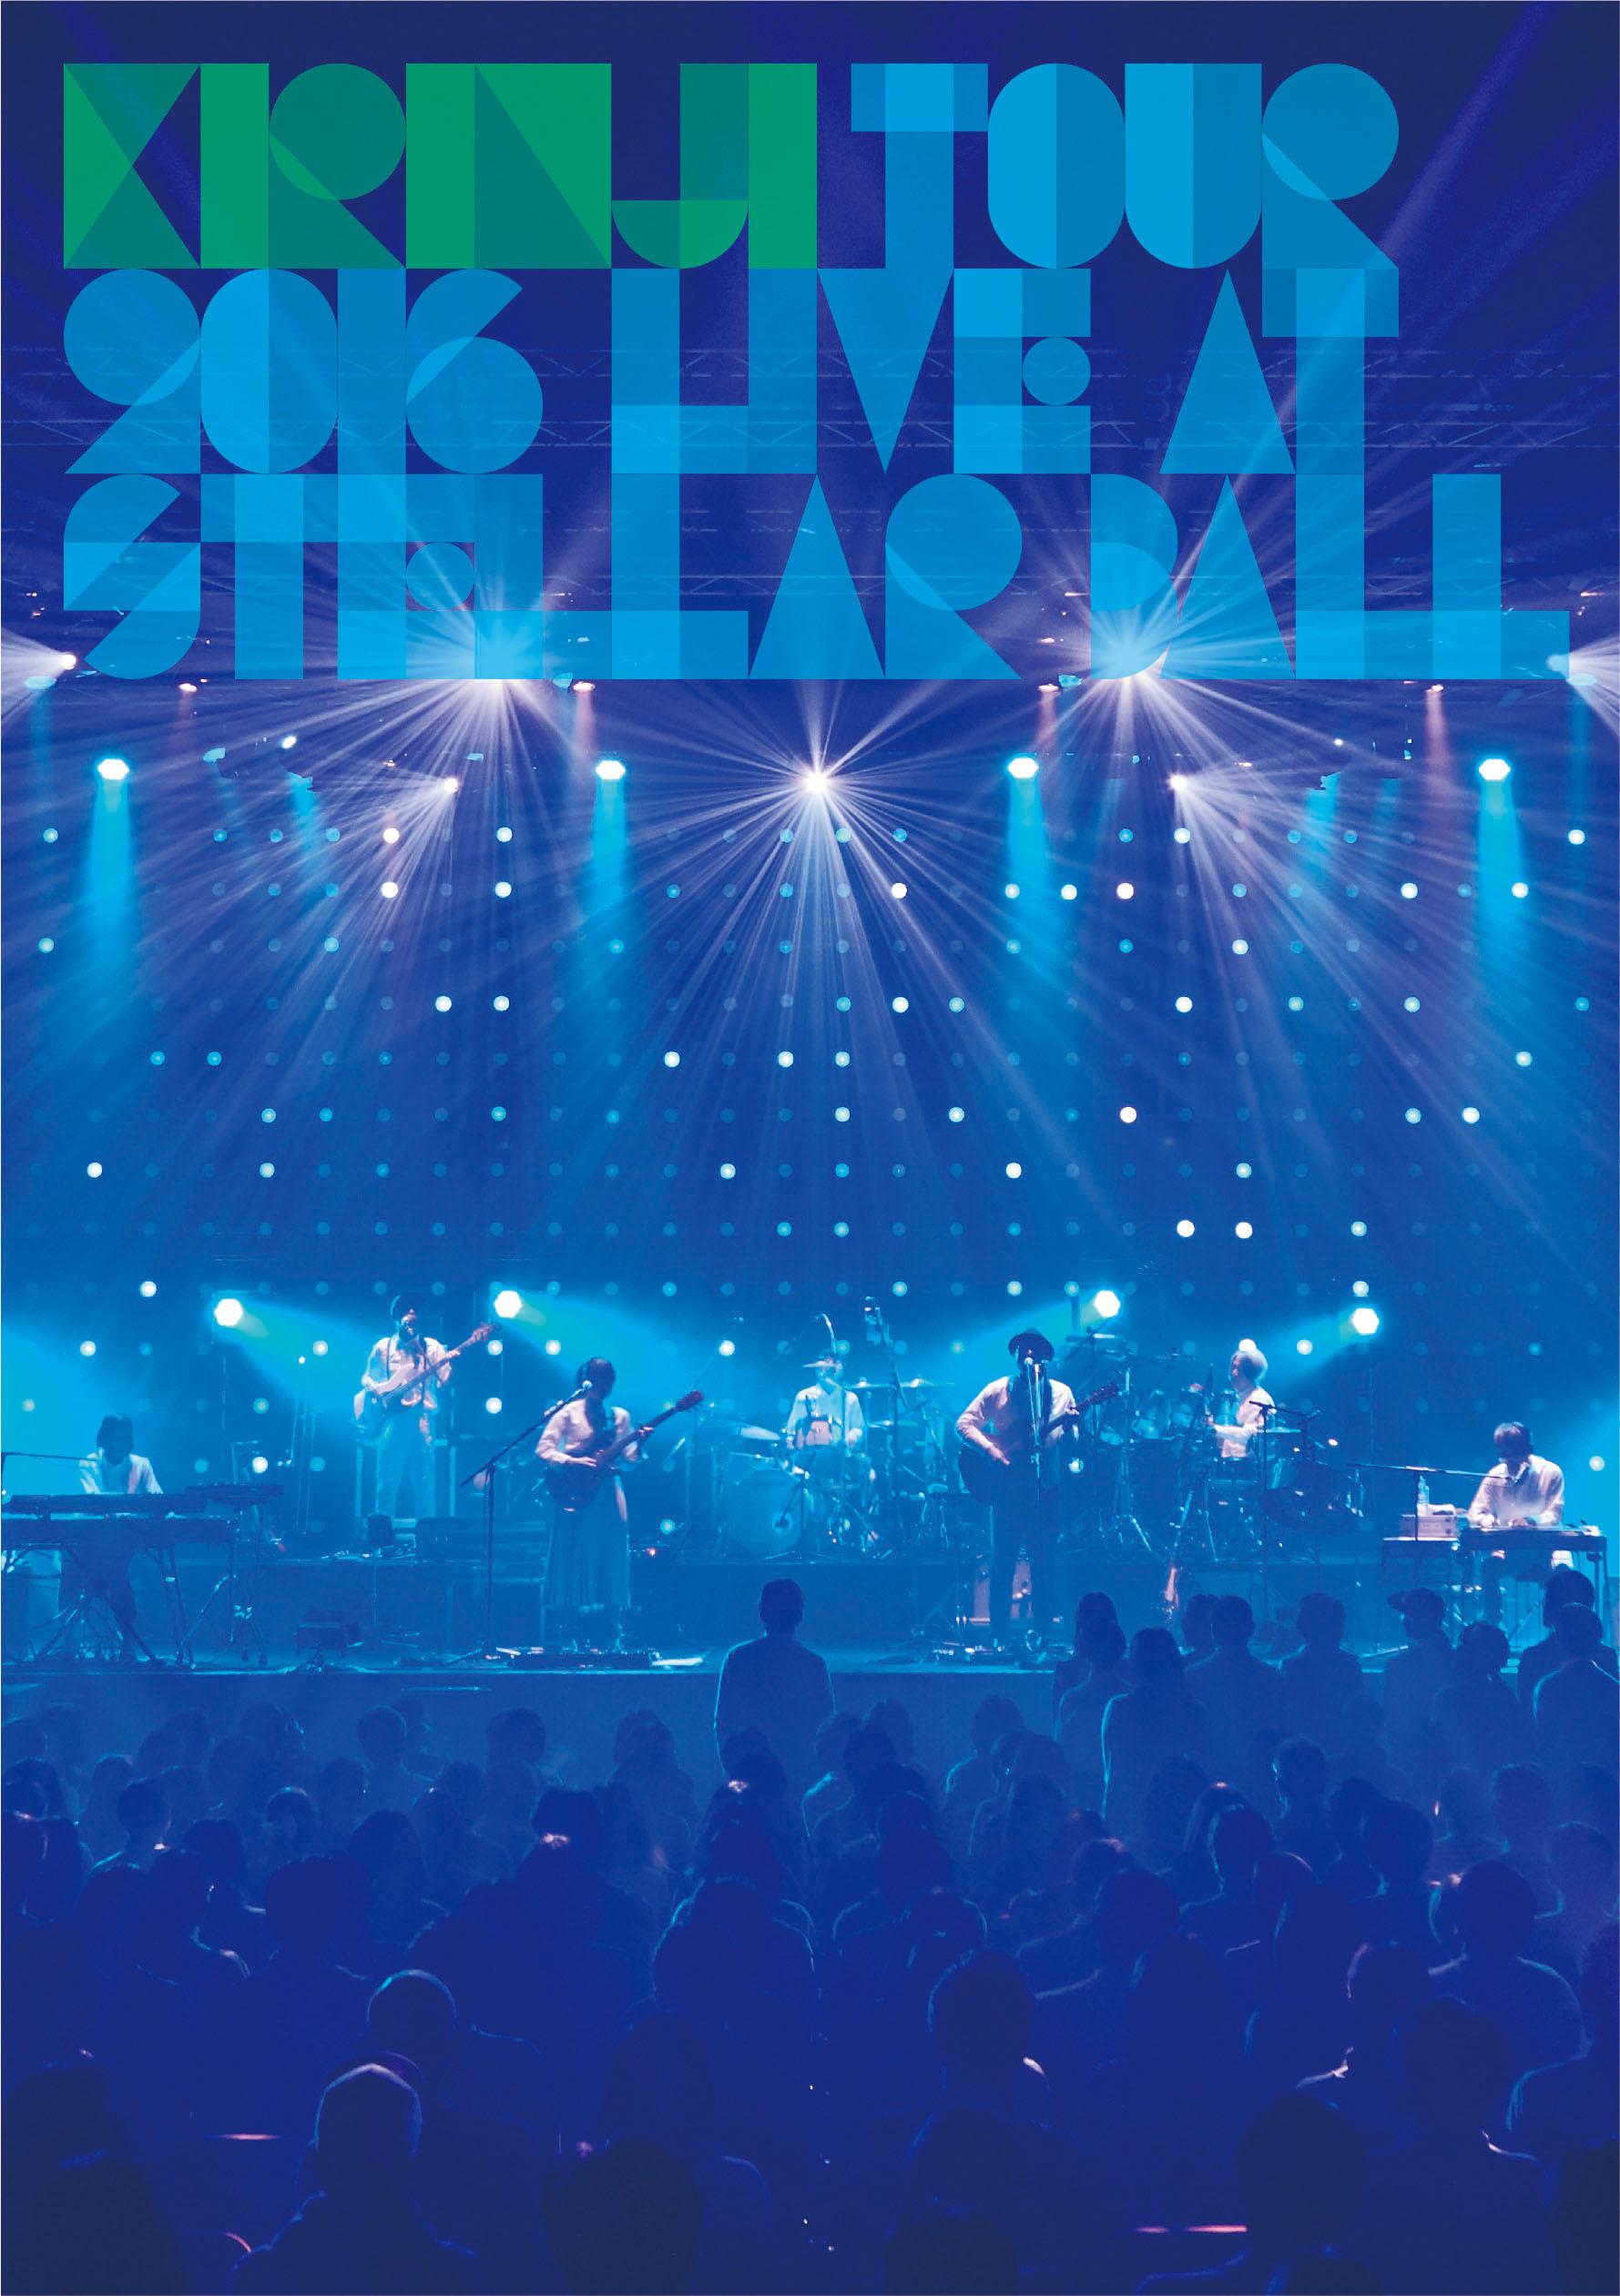 KIRINJI TOUR 2016 –Live at Stellar Ball-